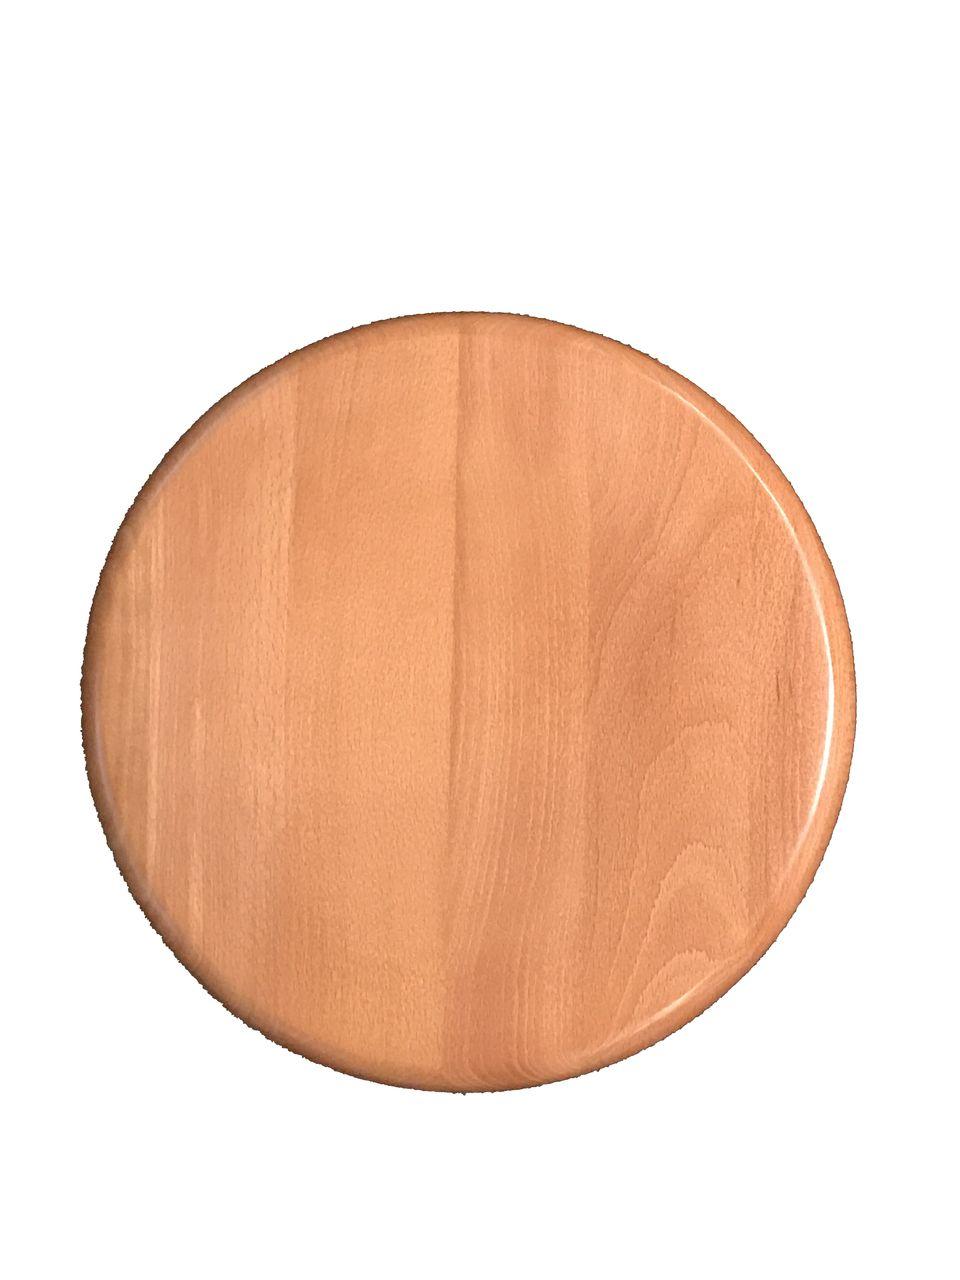 Round Solid Wood Seats Solid Wood Chairs Bar Stool Seats Wood Bar Stools